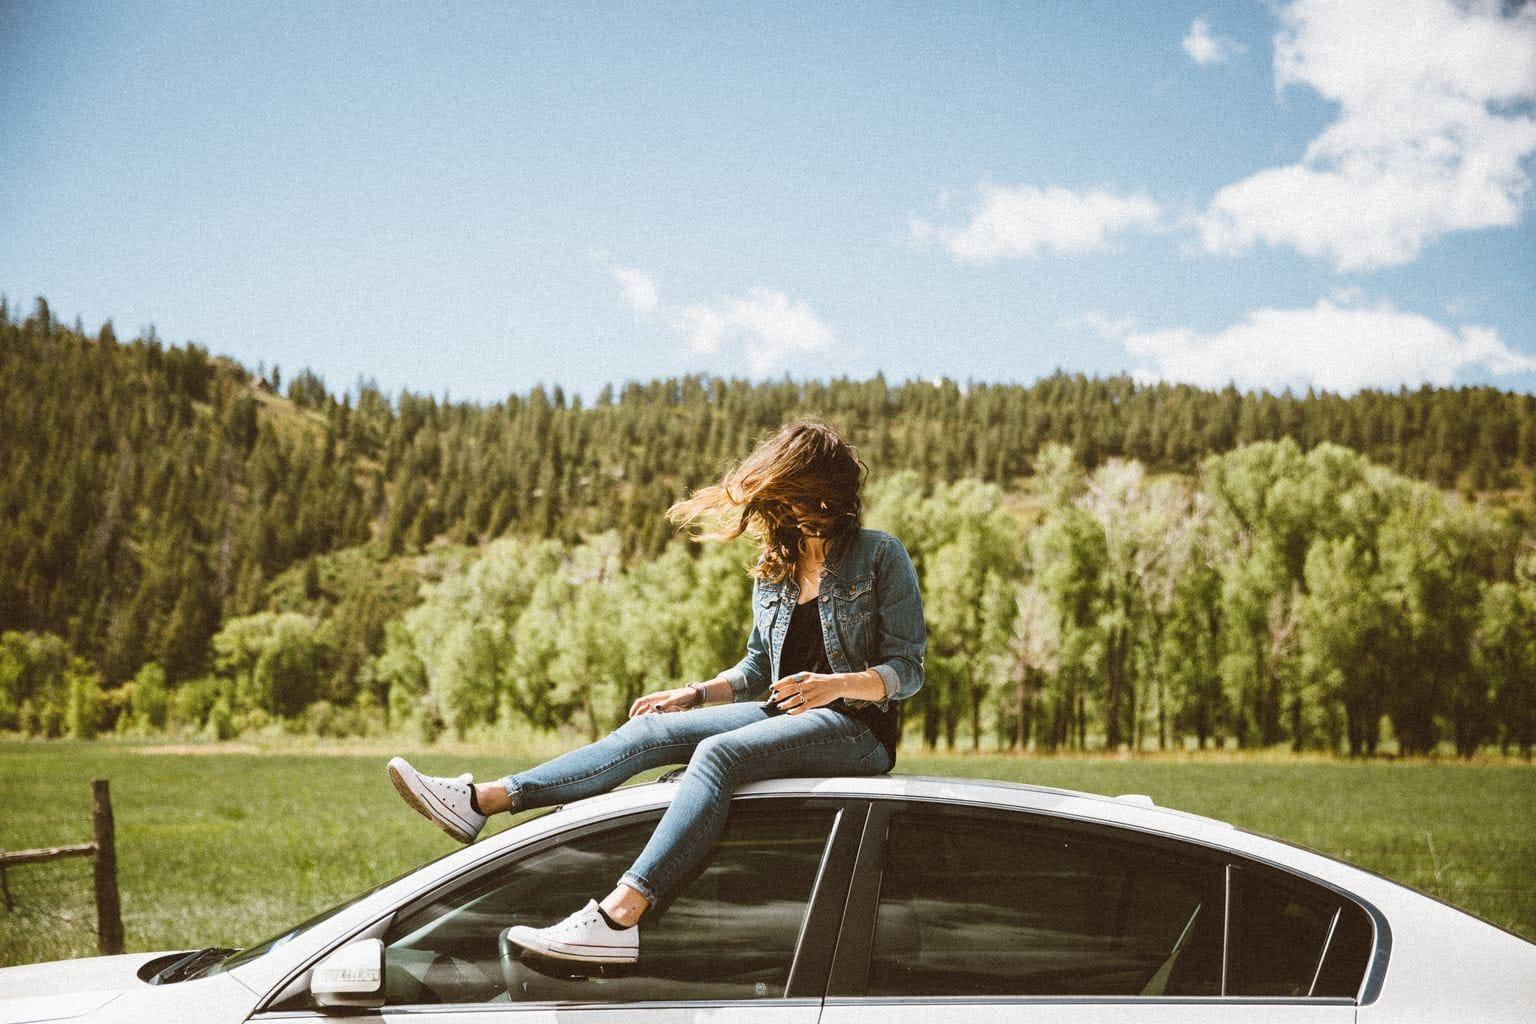 girl, road trip, adventure, explore